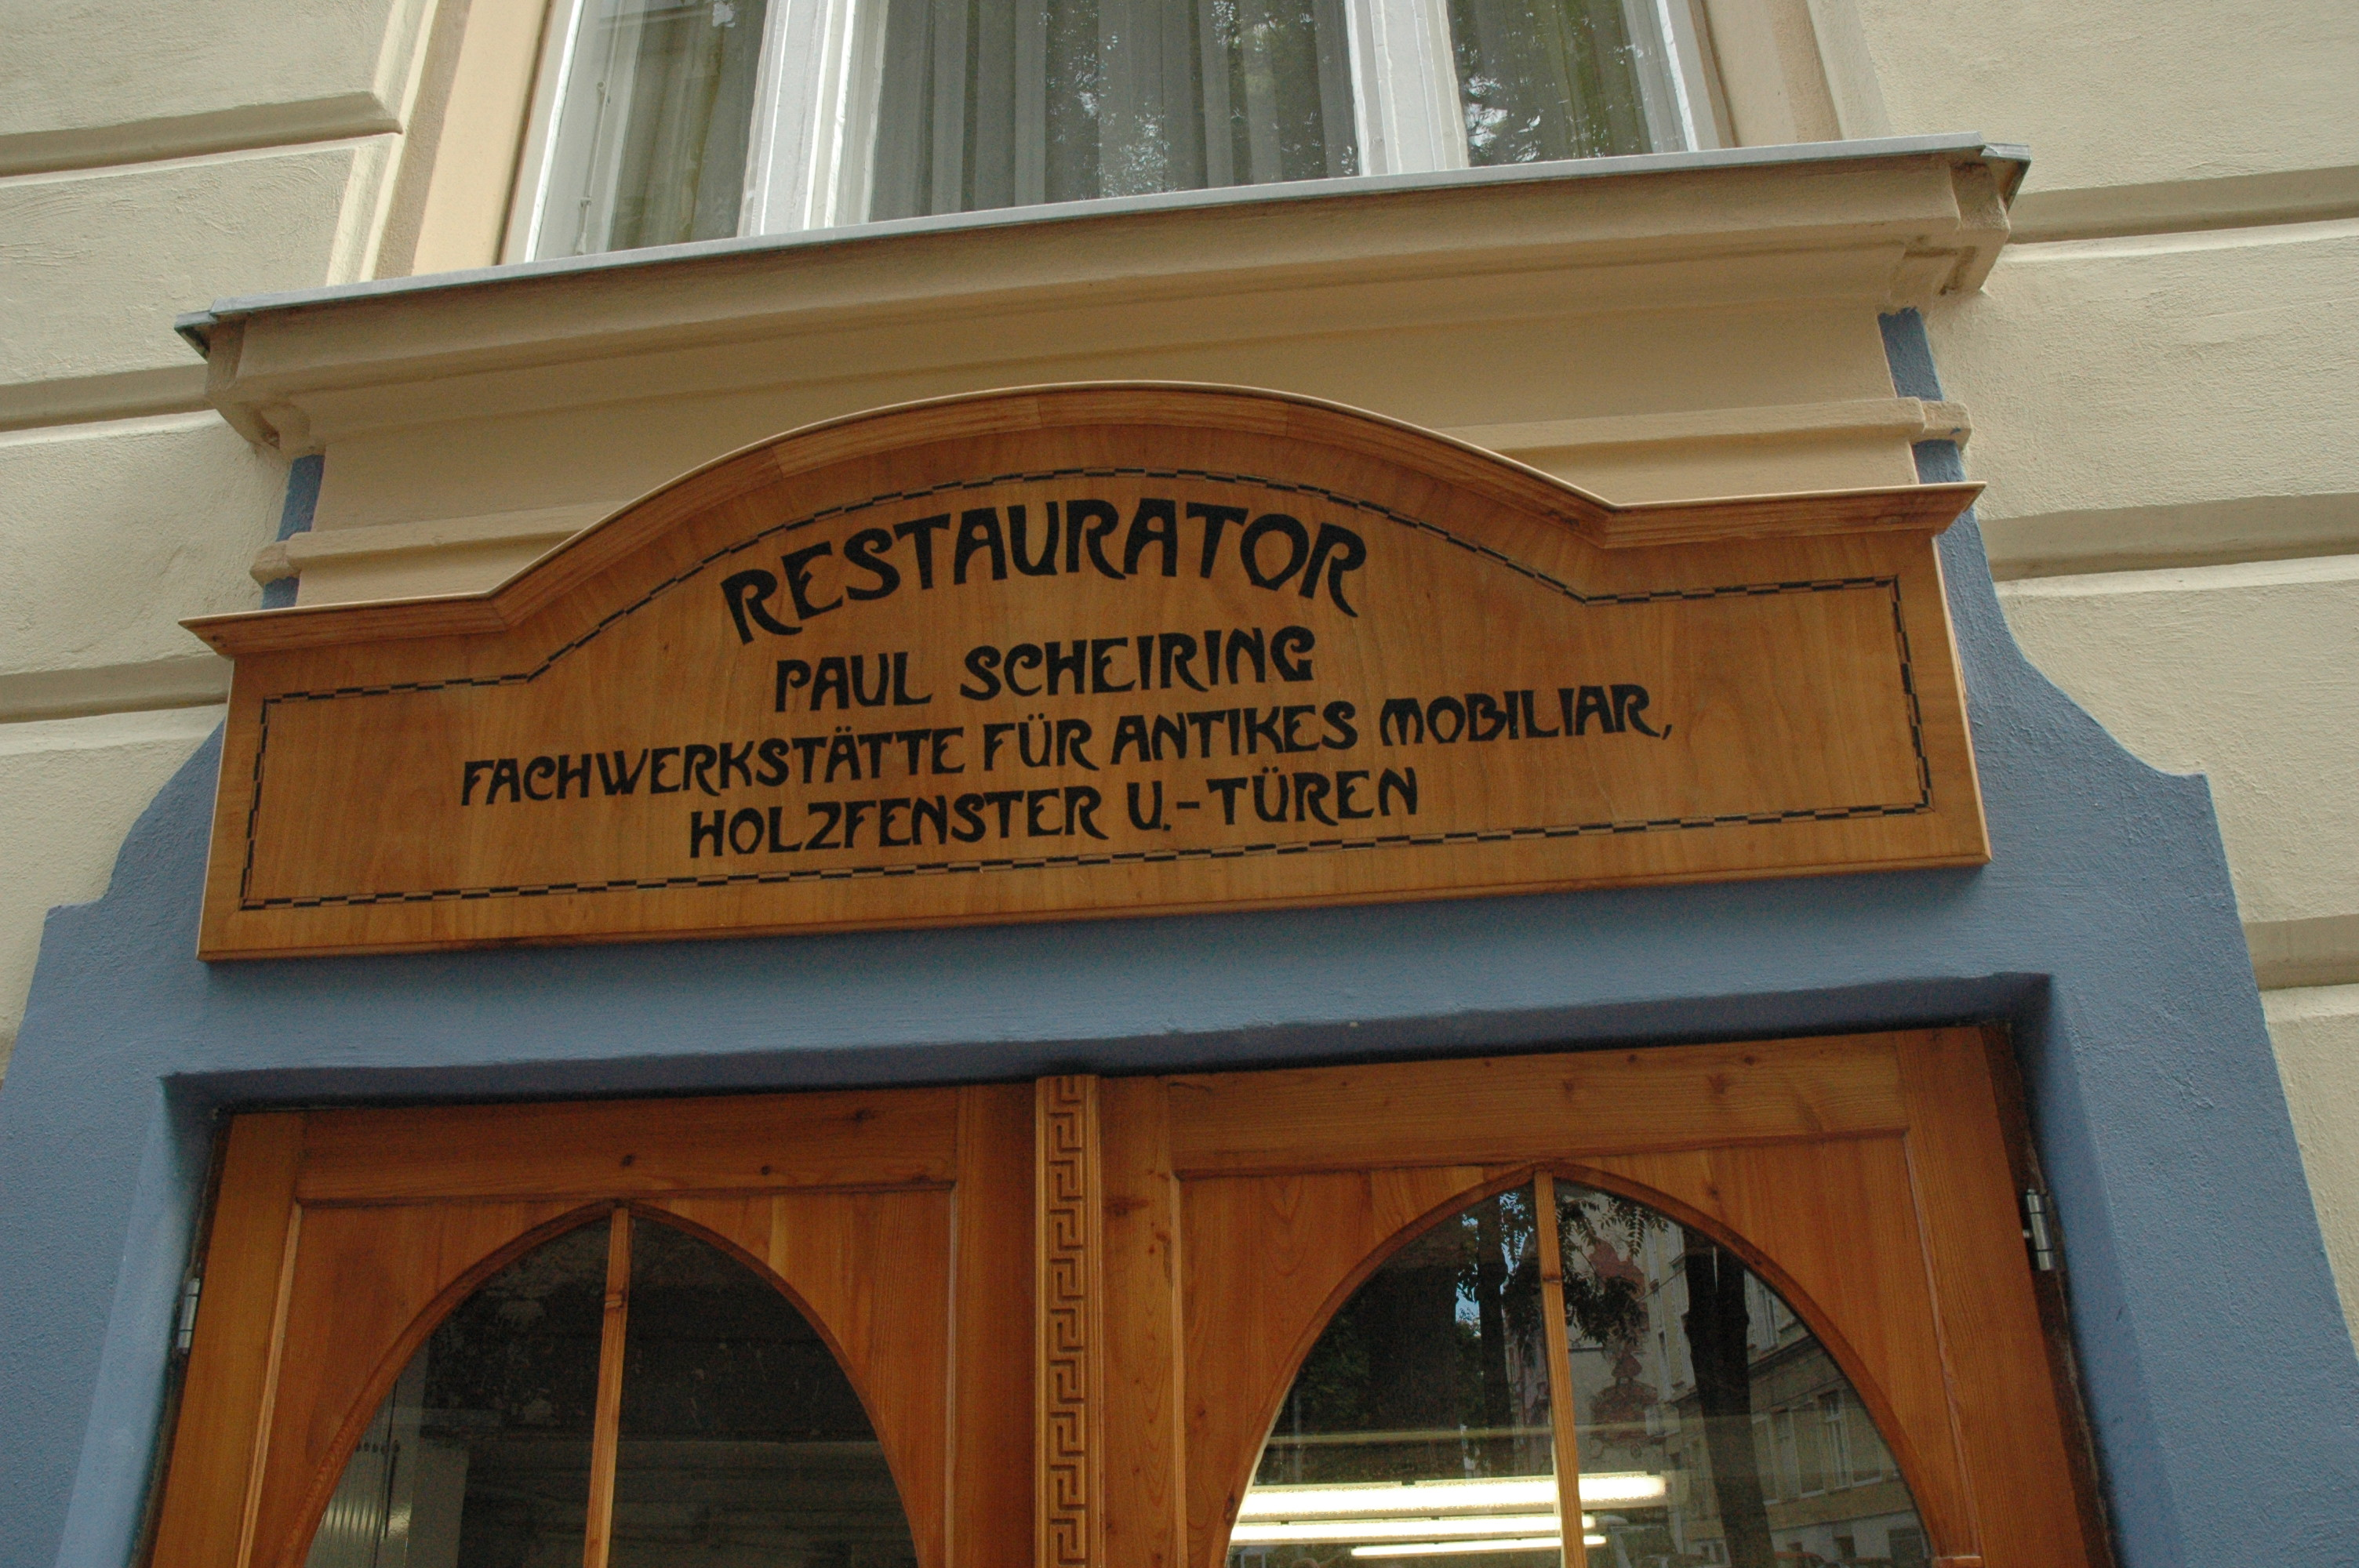 Portalrestaurator